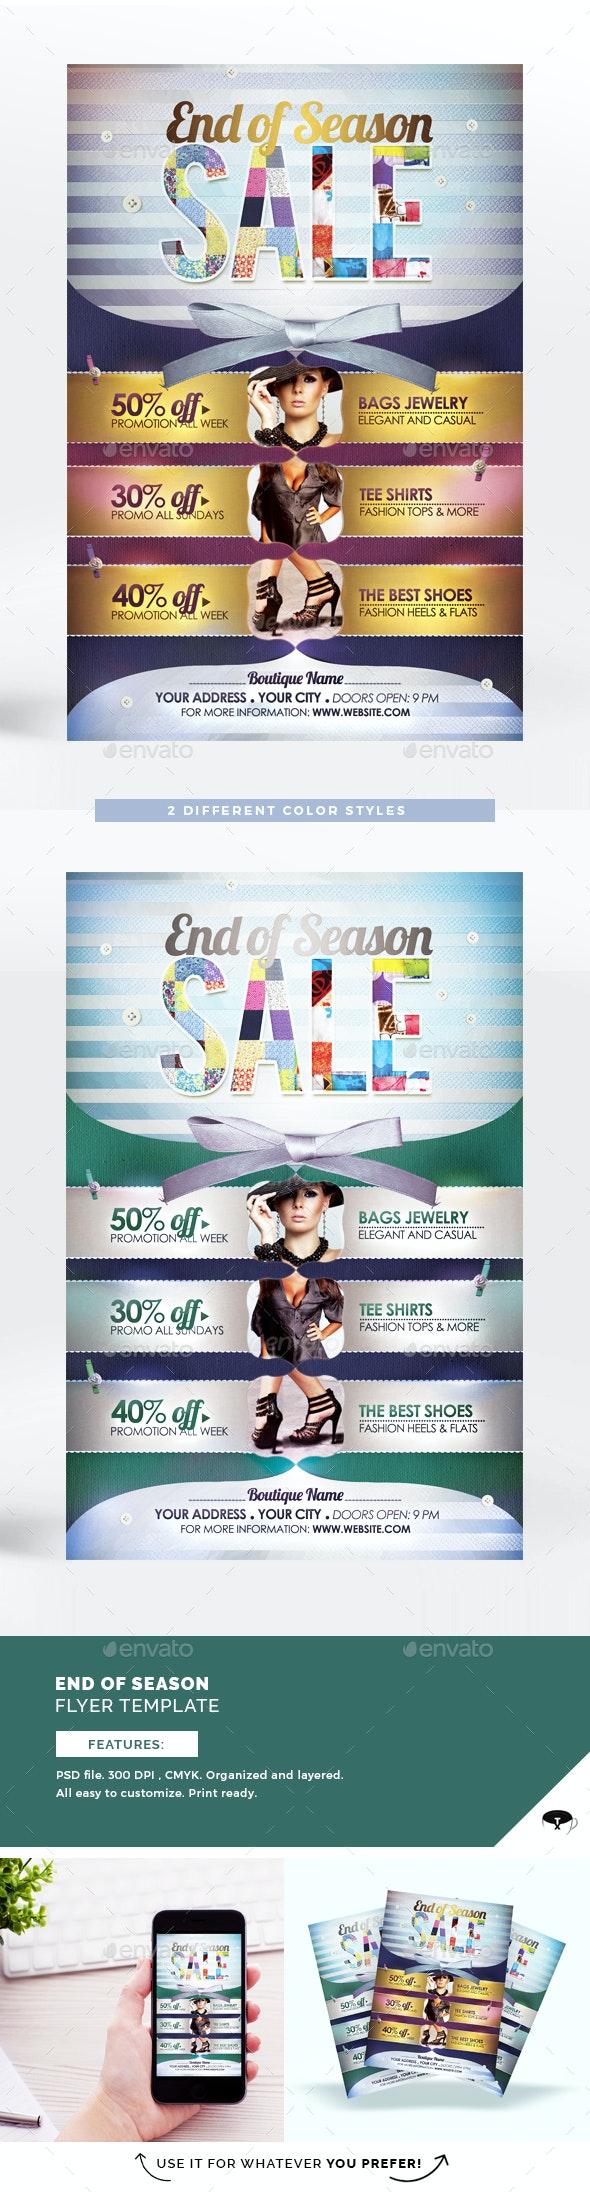 End of Season Sale Flyer Template - Commerce Flyers